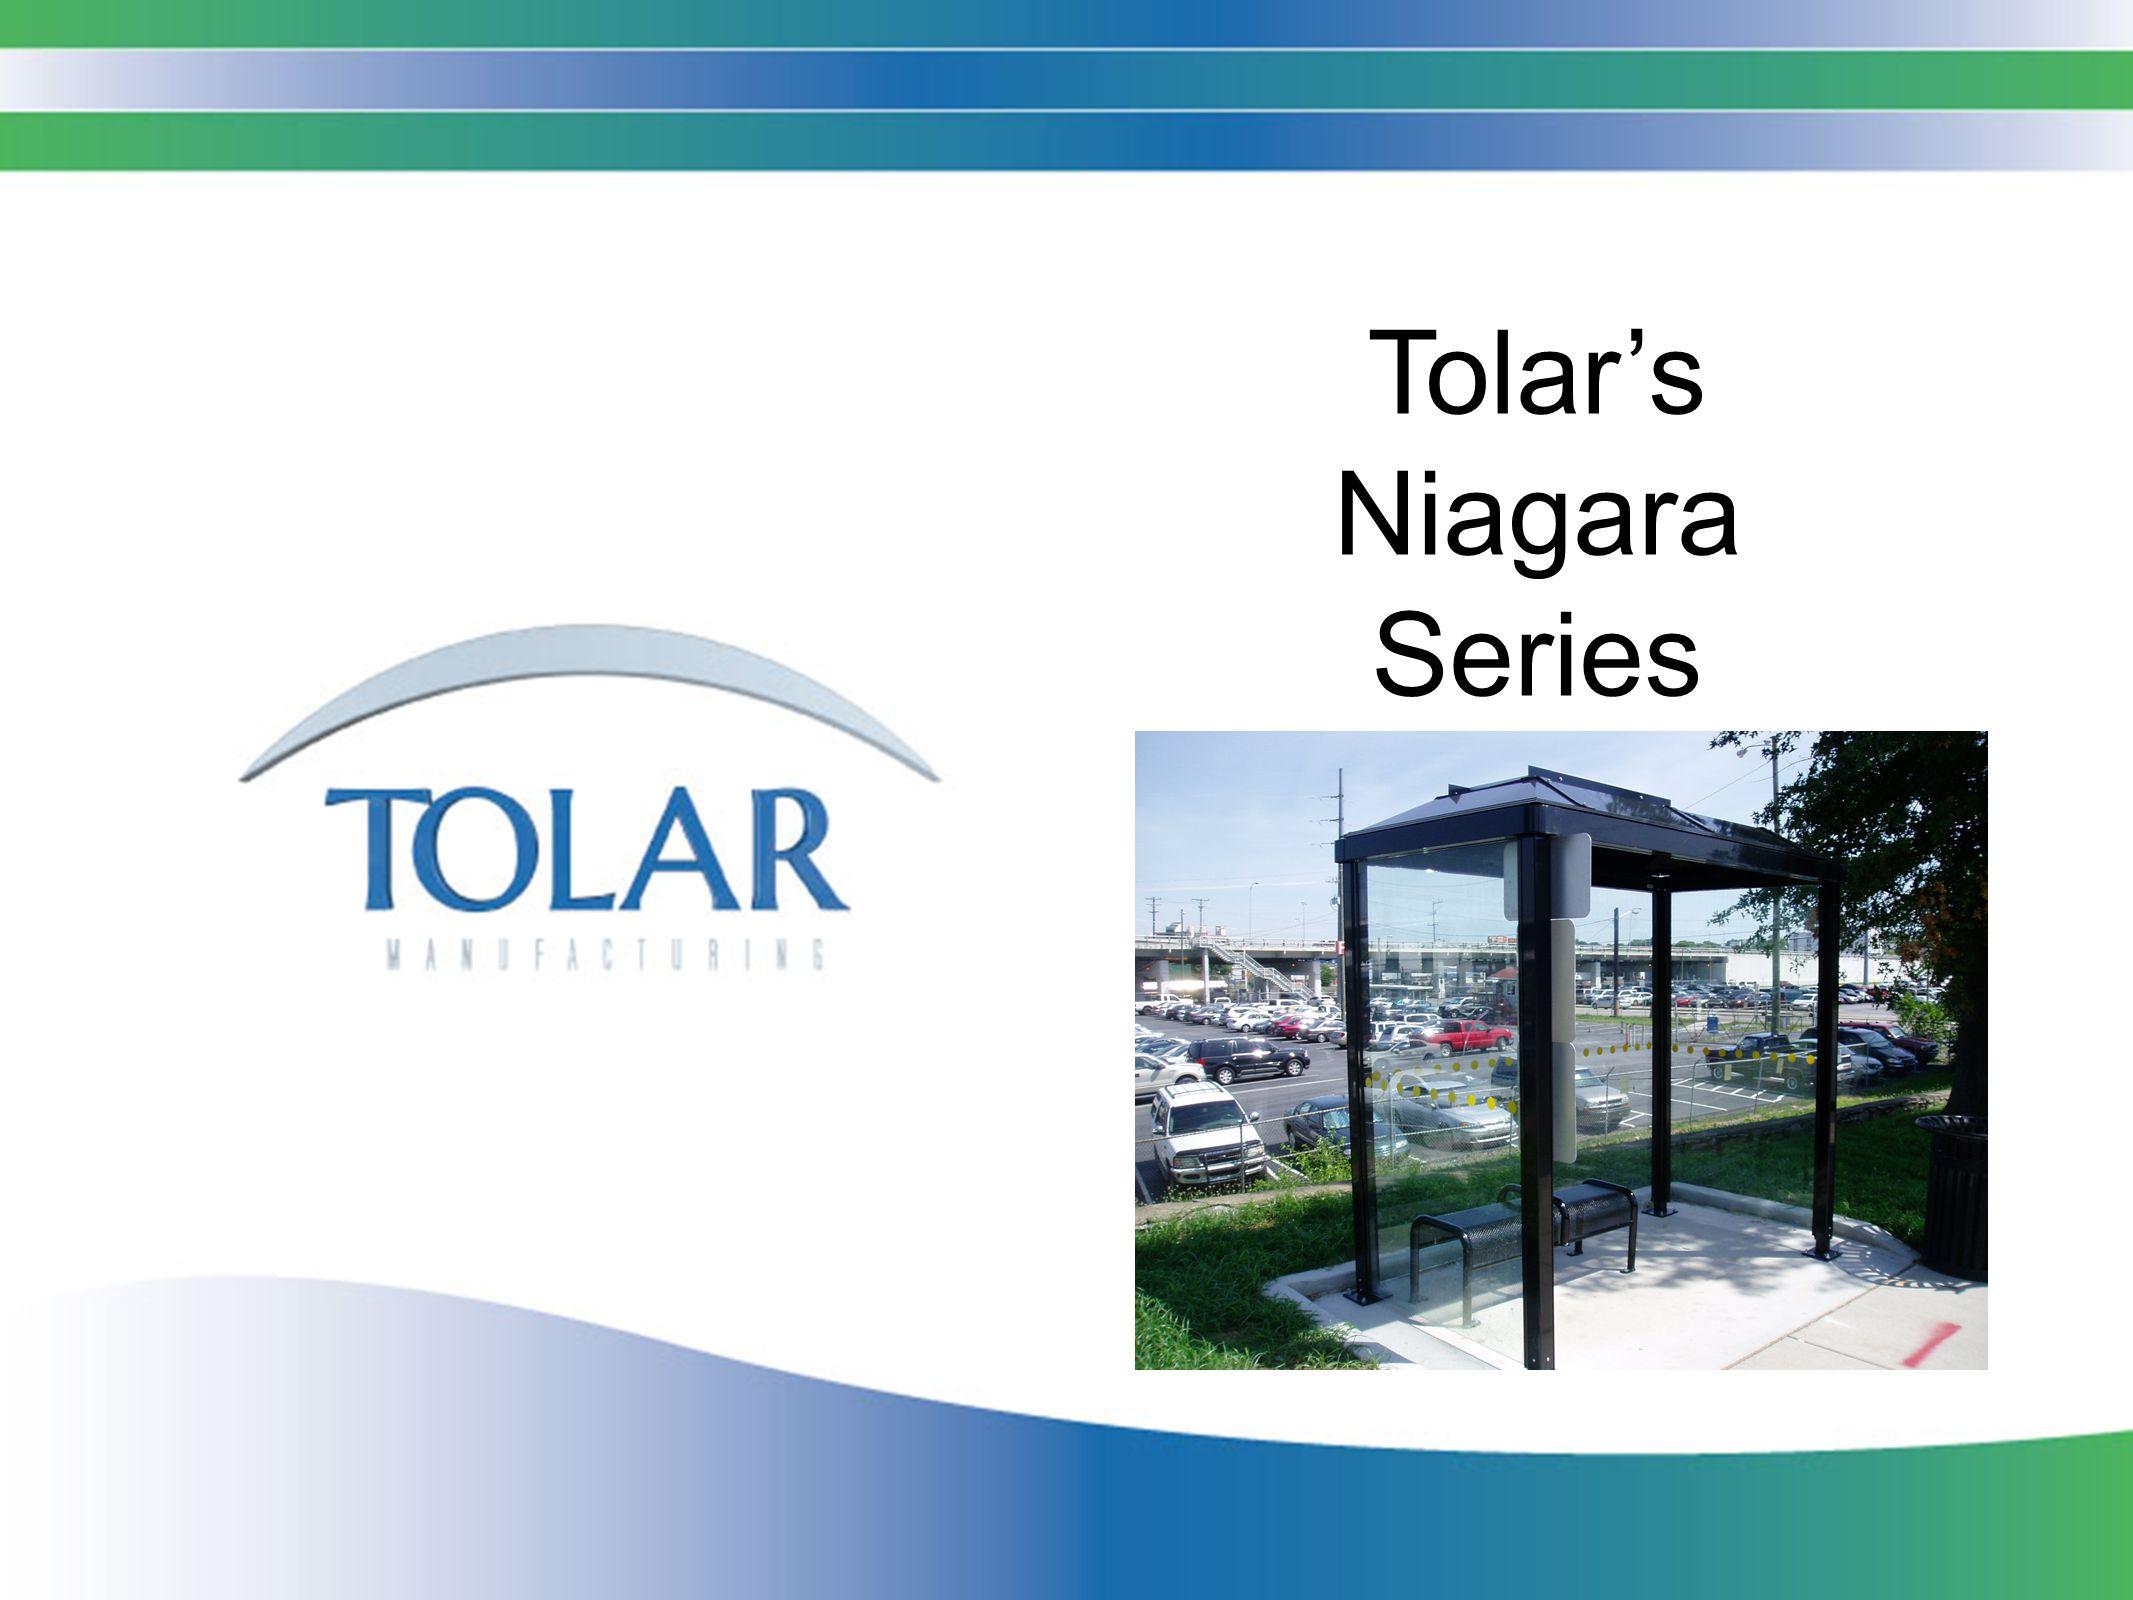 Tolar's Niagara Series